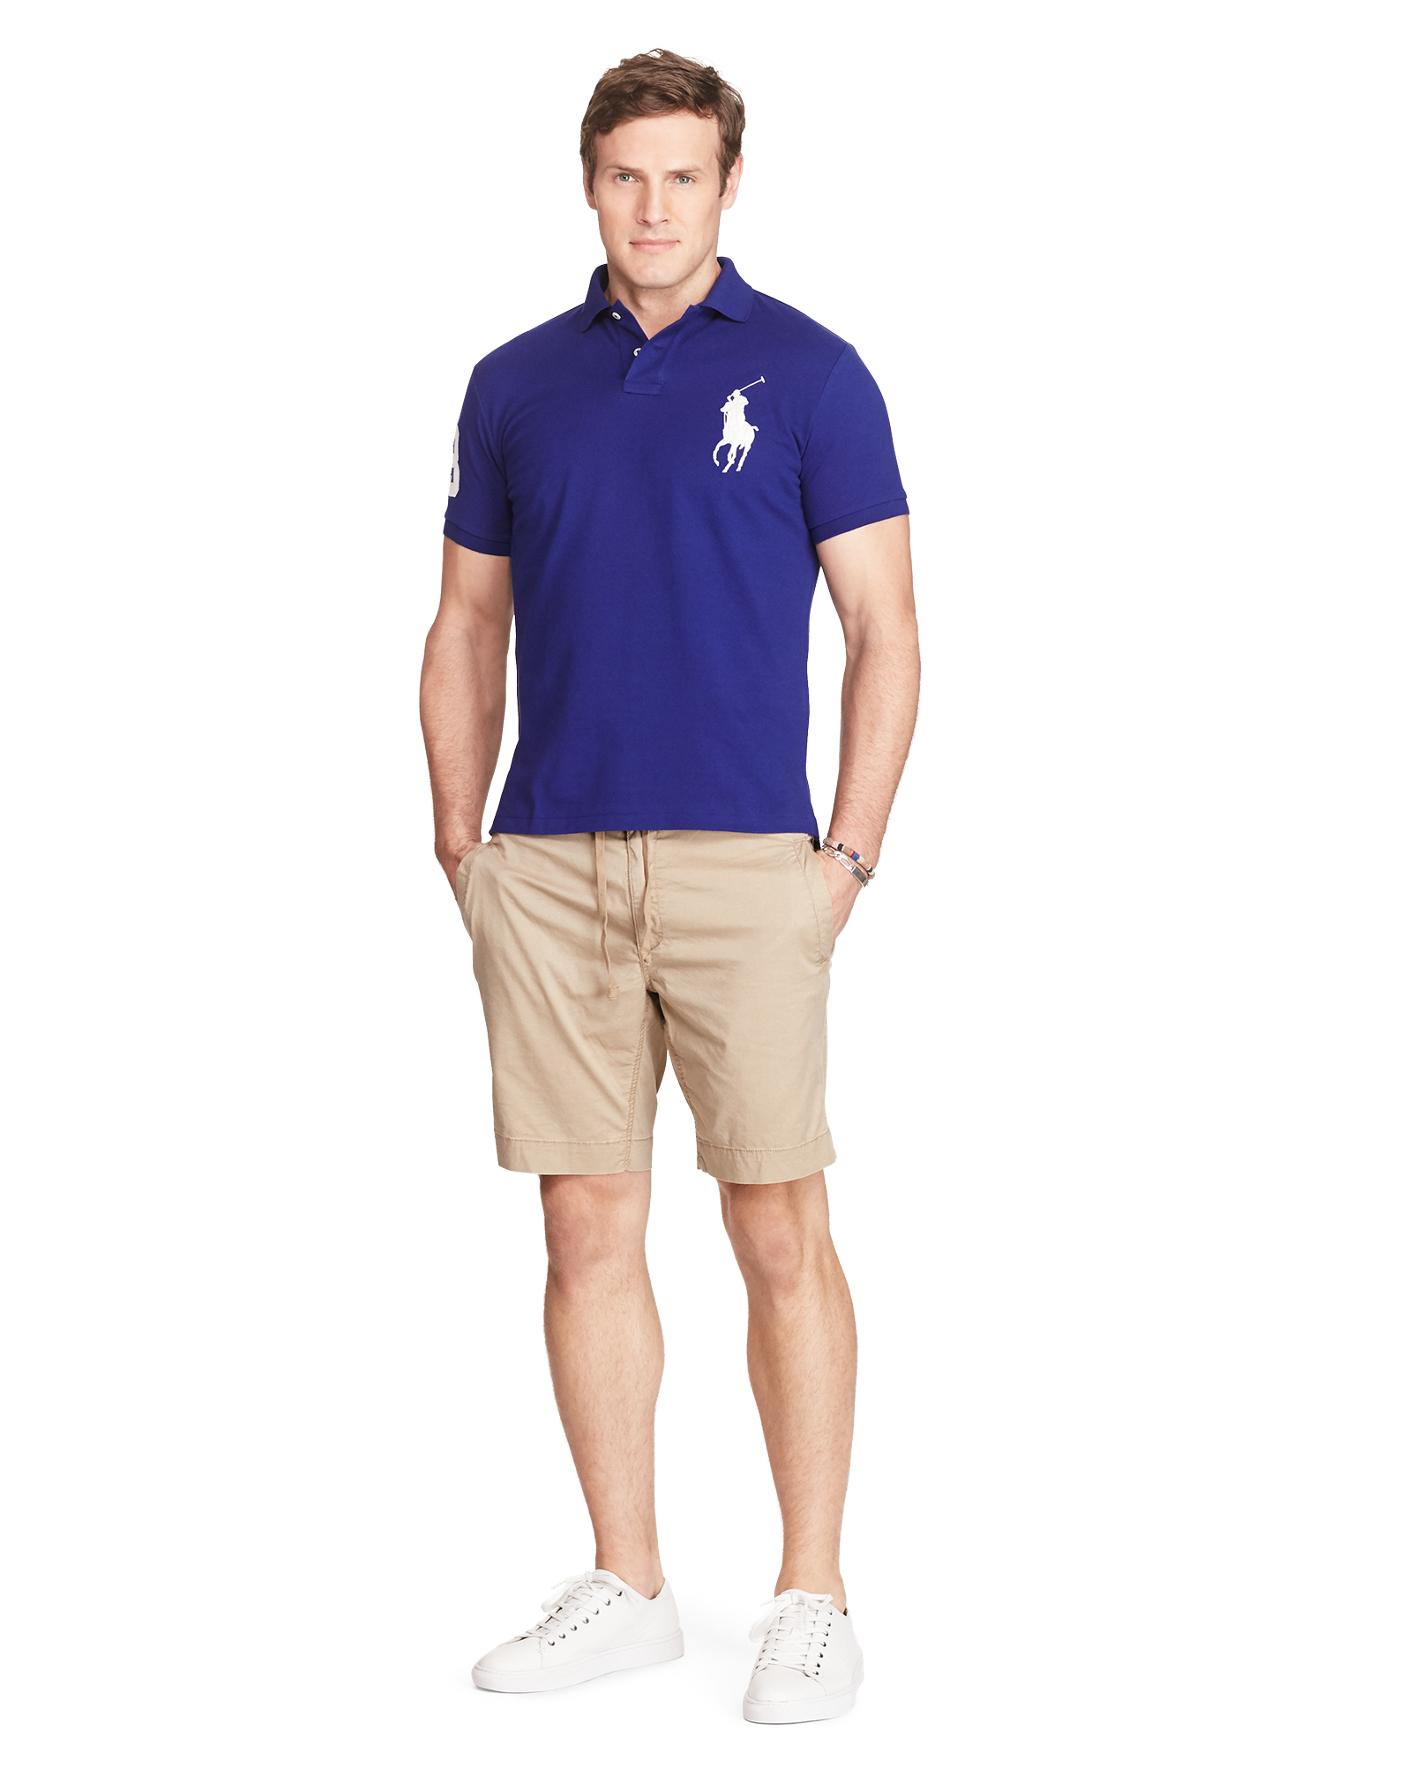 Polo shirts for men shirts rock for Big and tall polo shirts on sale